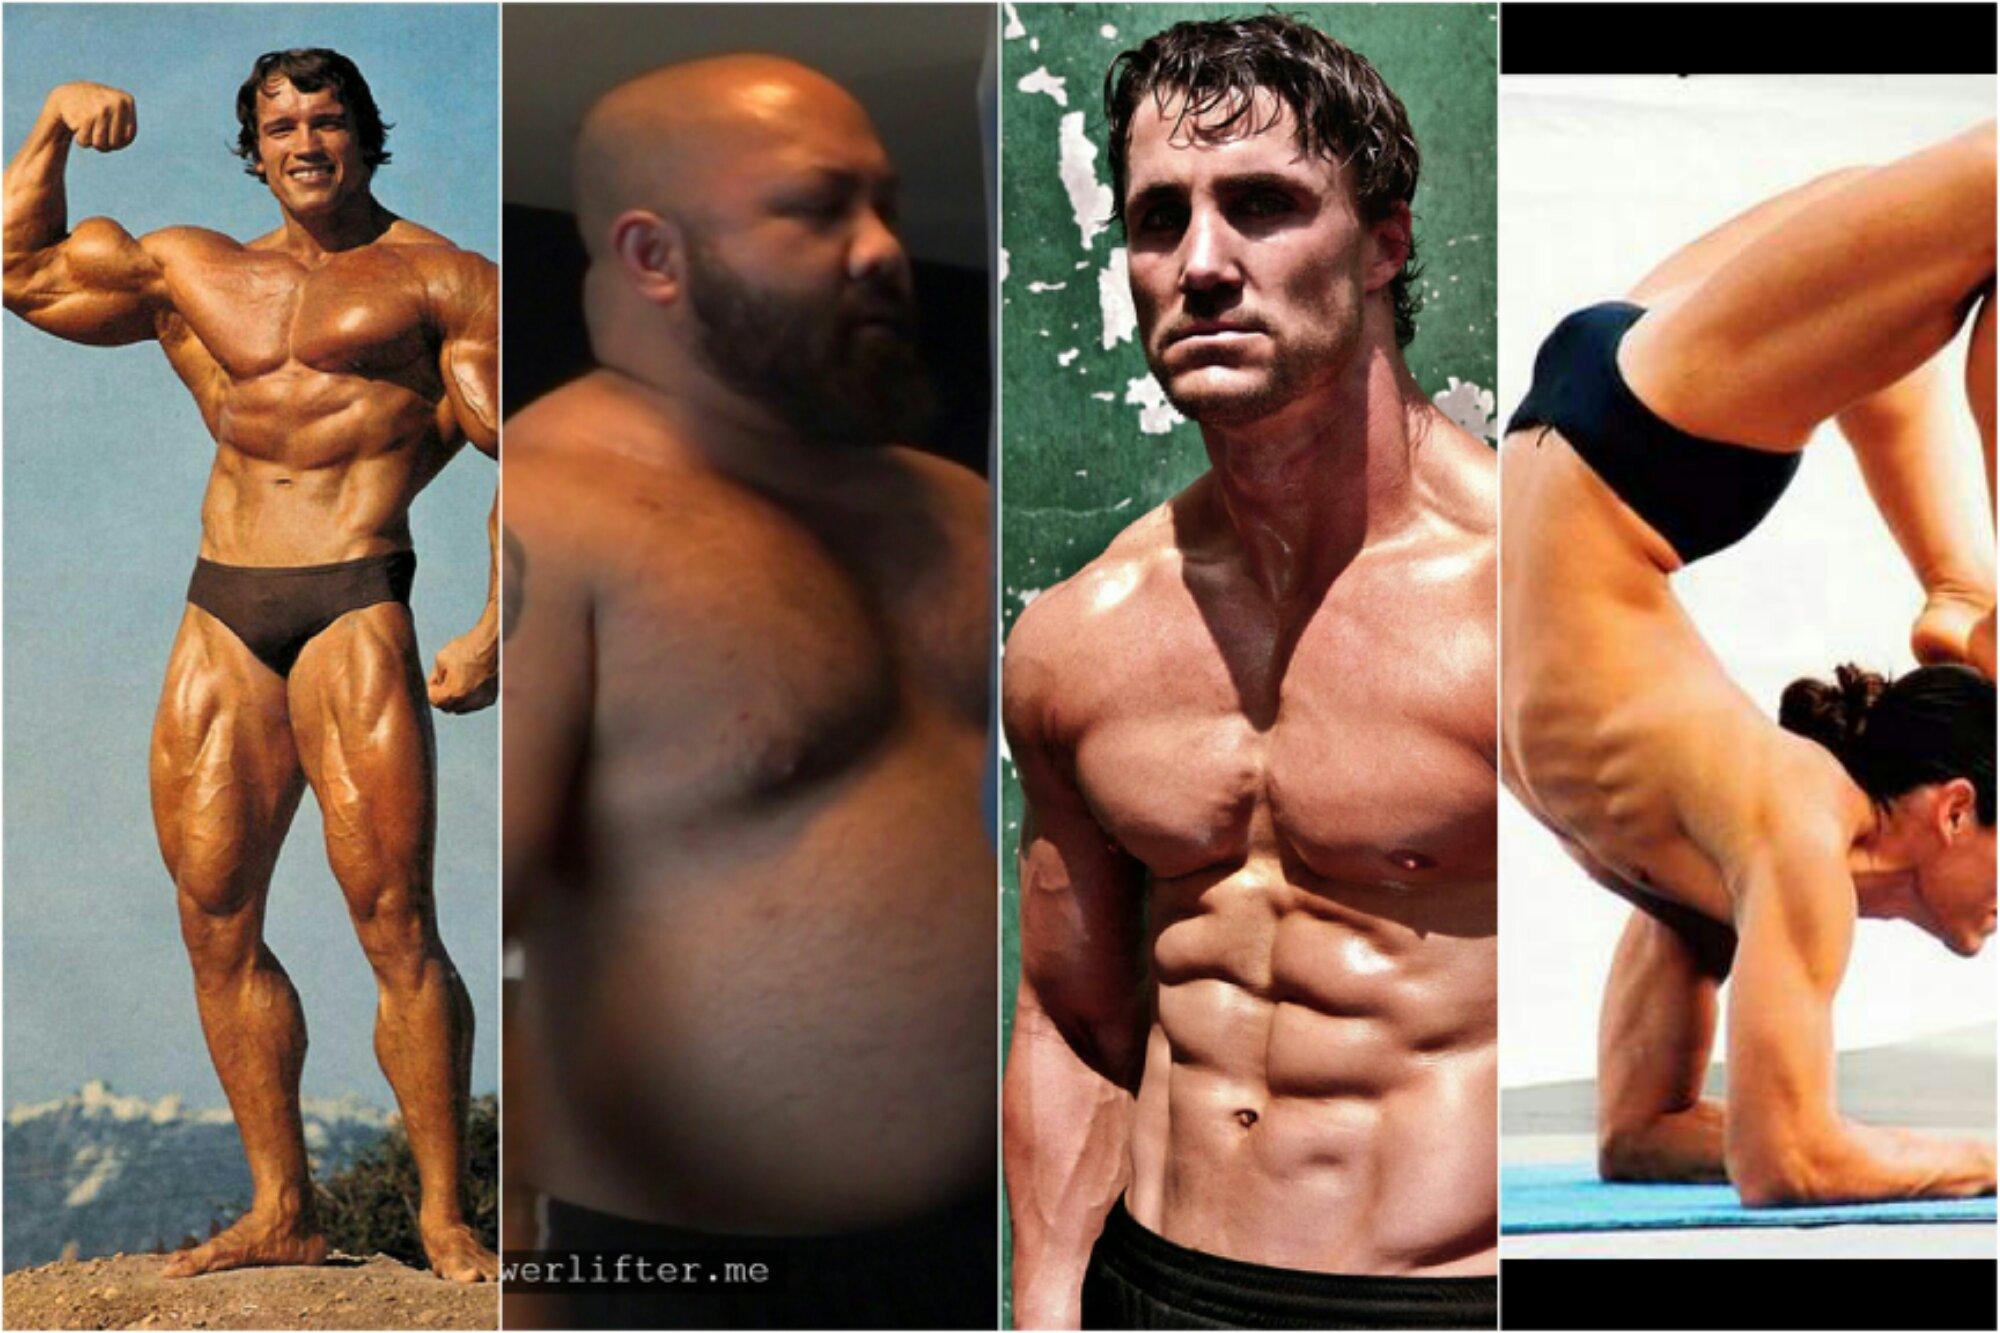 greg plitt, arnold, power lifting, comparison.